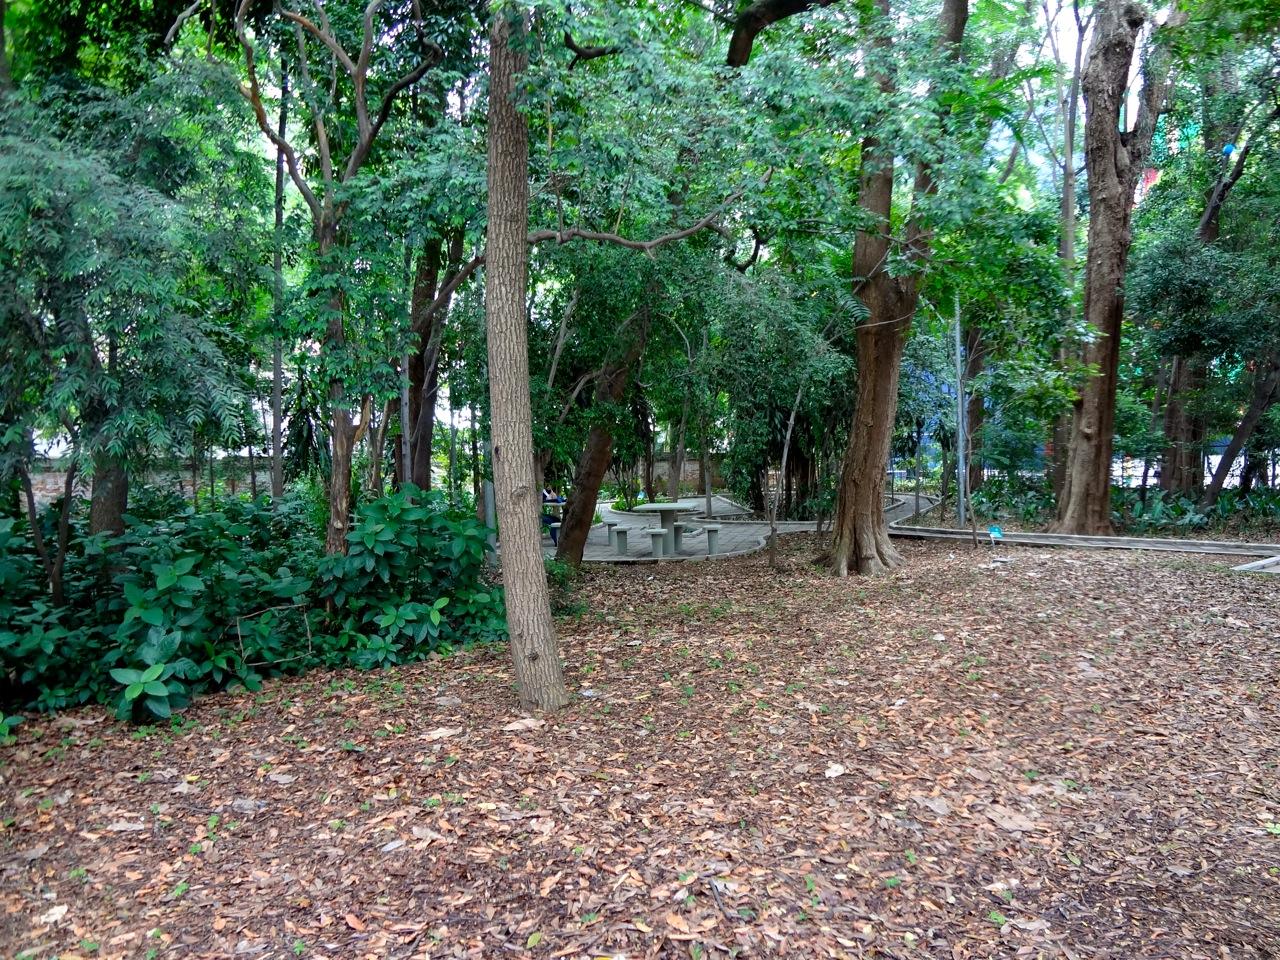 DSC00111 - Série Avenida Paulista: a Villa Fortunata e o parque. Como é o nome mesmo?